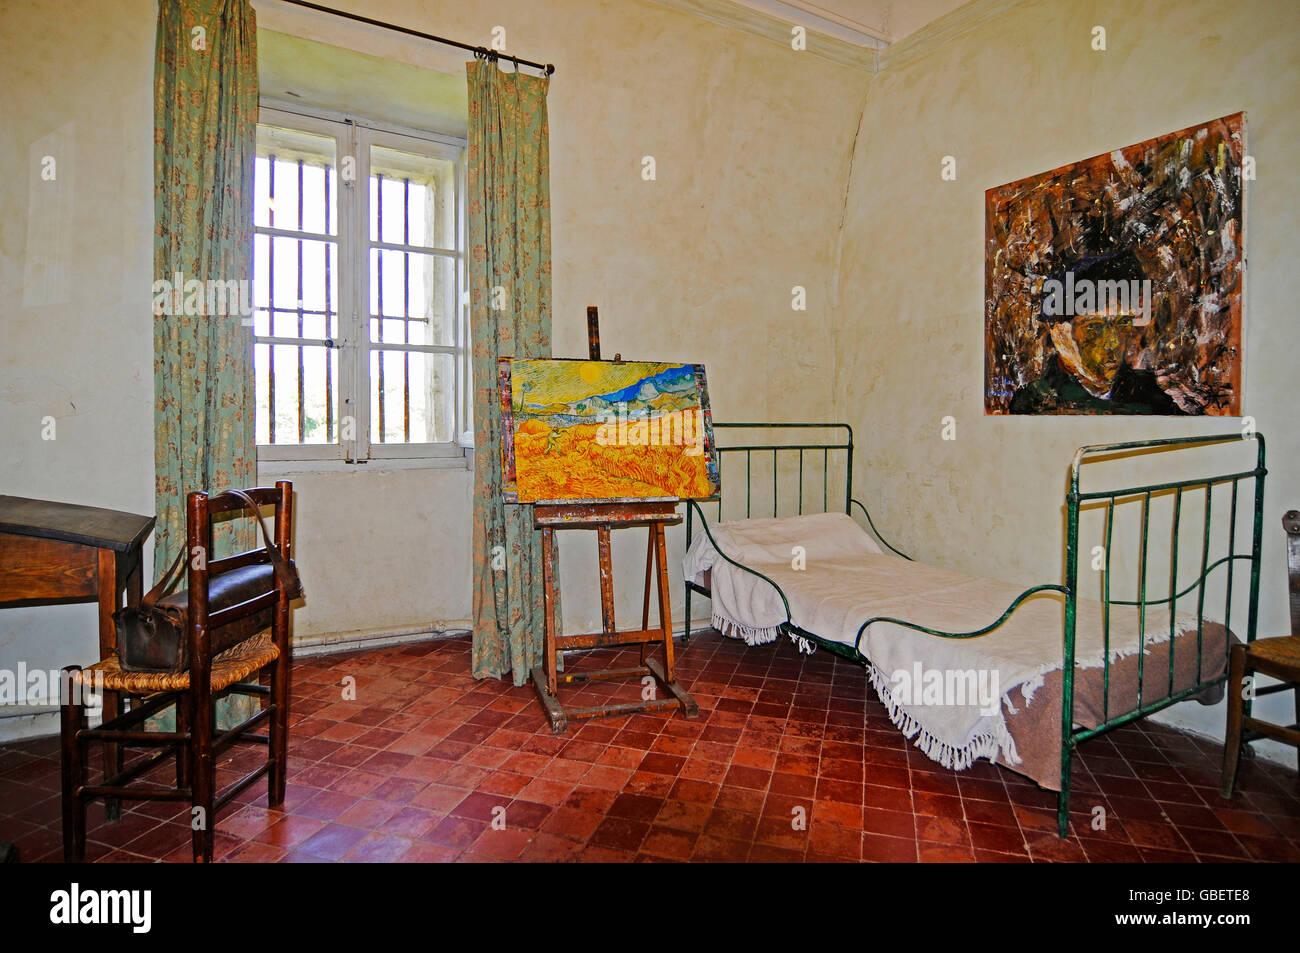 Saint Paul de Mausole, Vincent van Gogh, el convento, iglesia, museo, Salon de Provence, Provenza, Cote d'Azur, Foto de stock